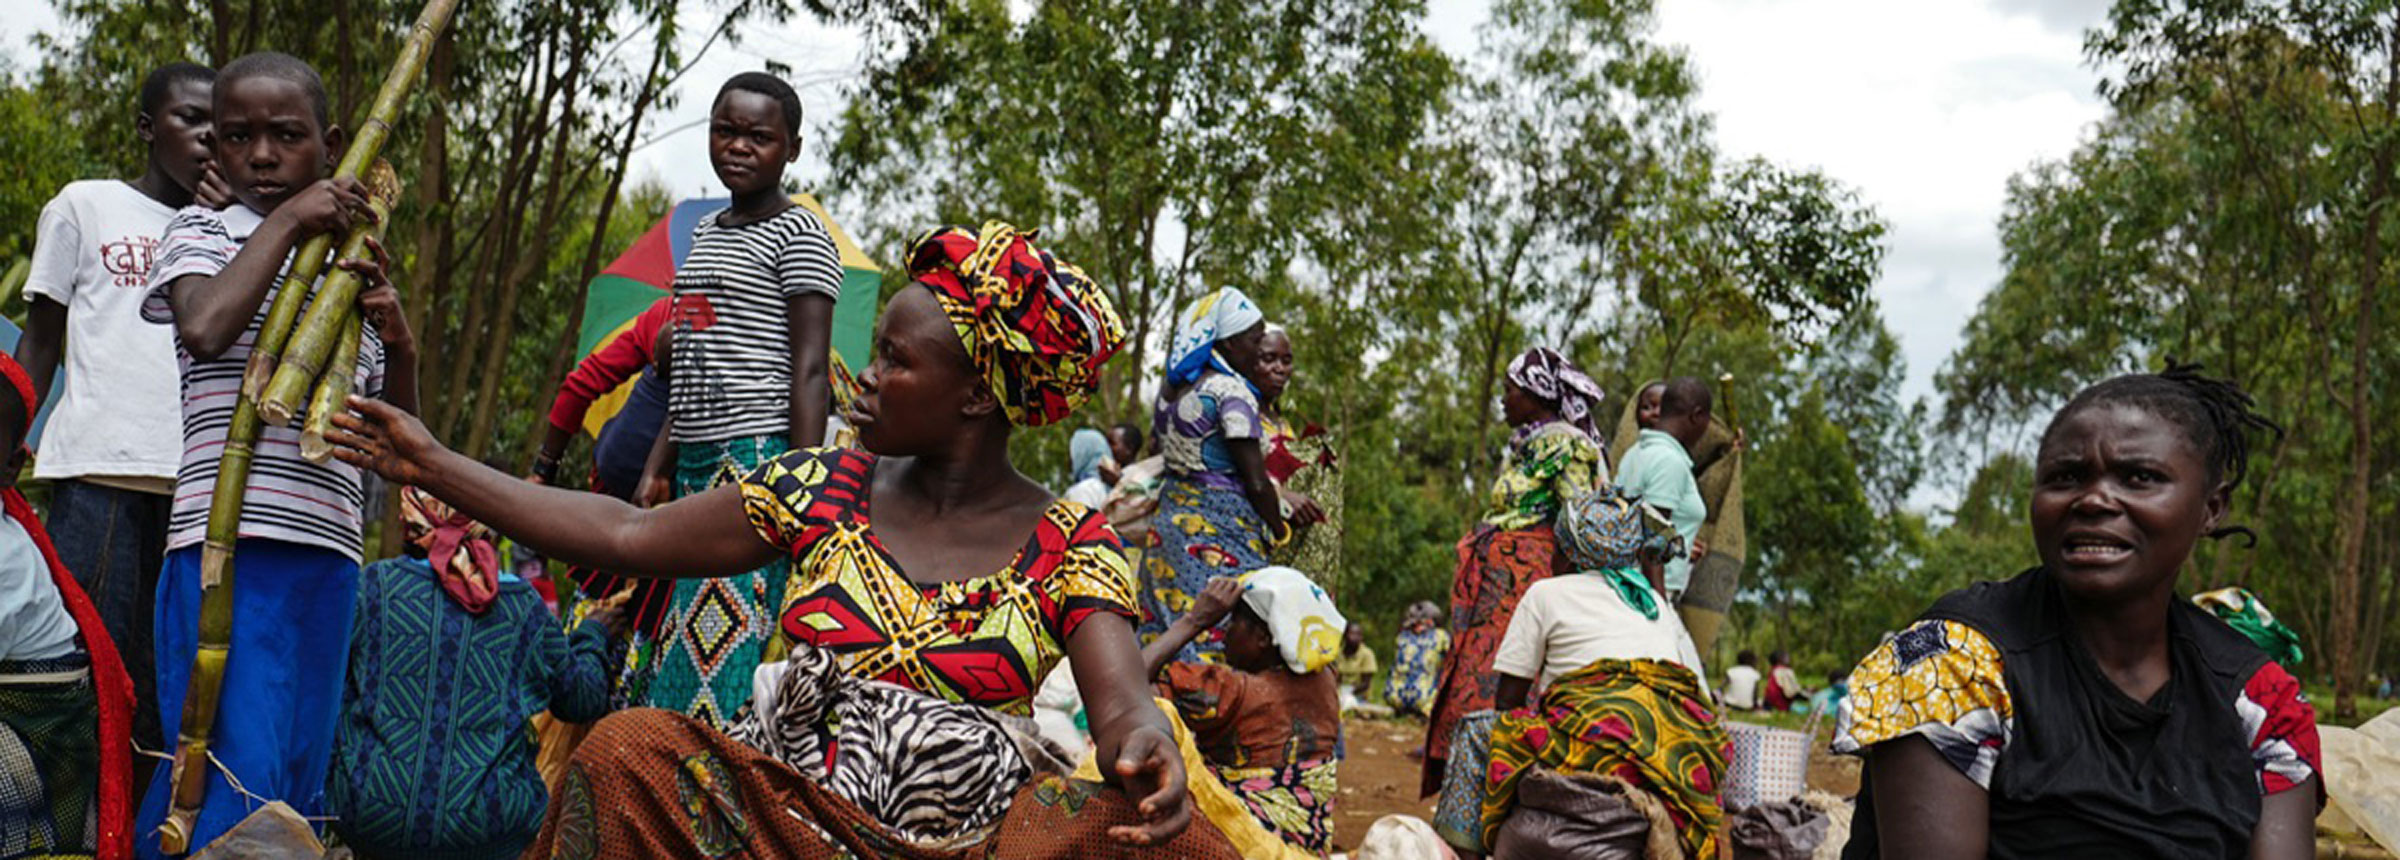 DRC community